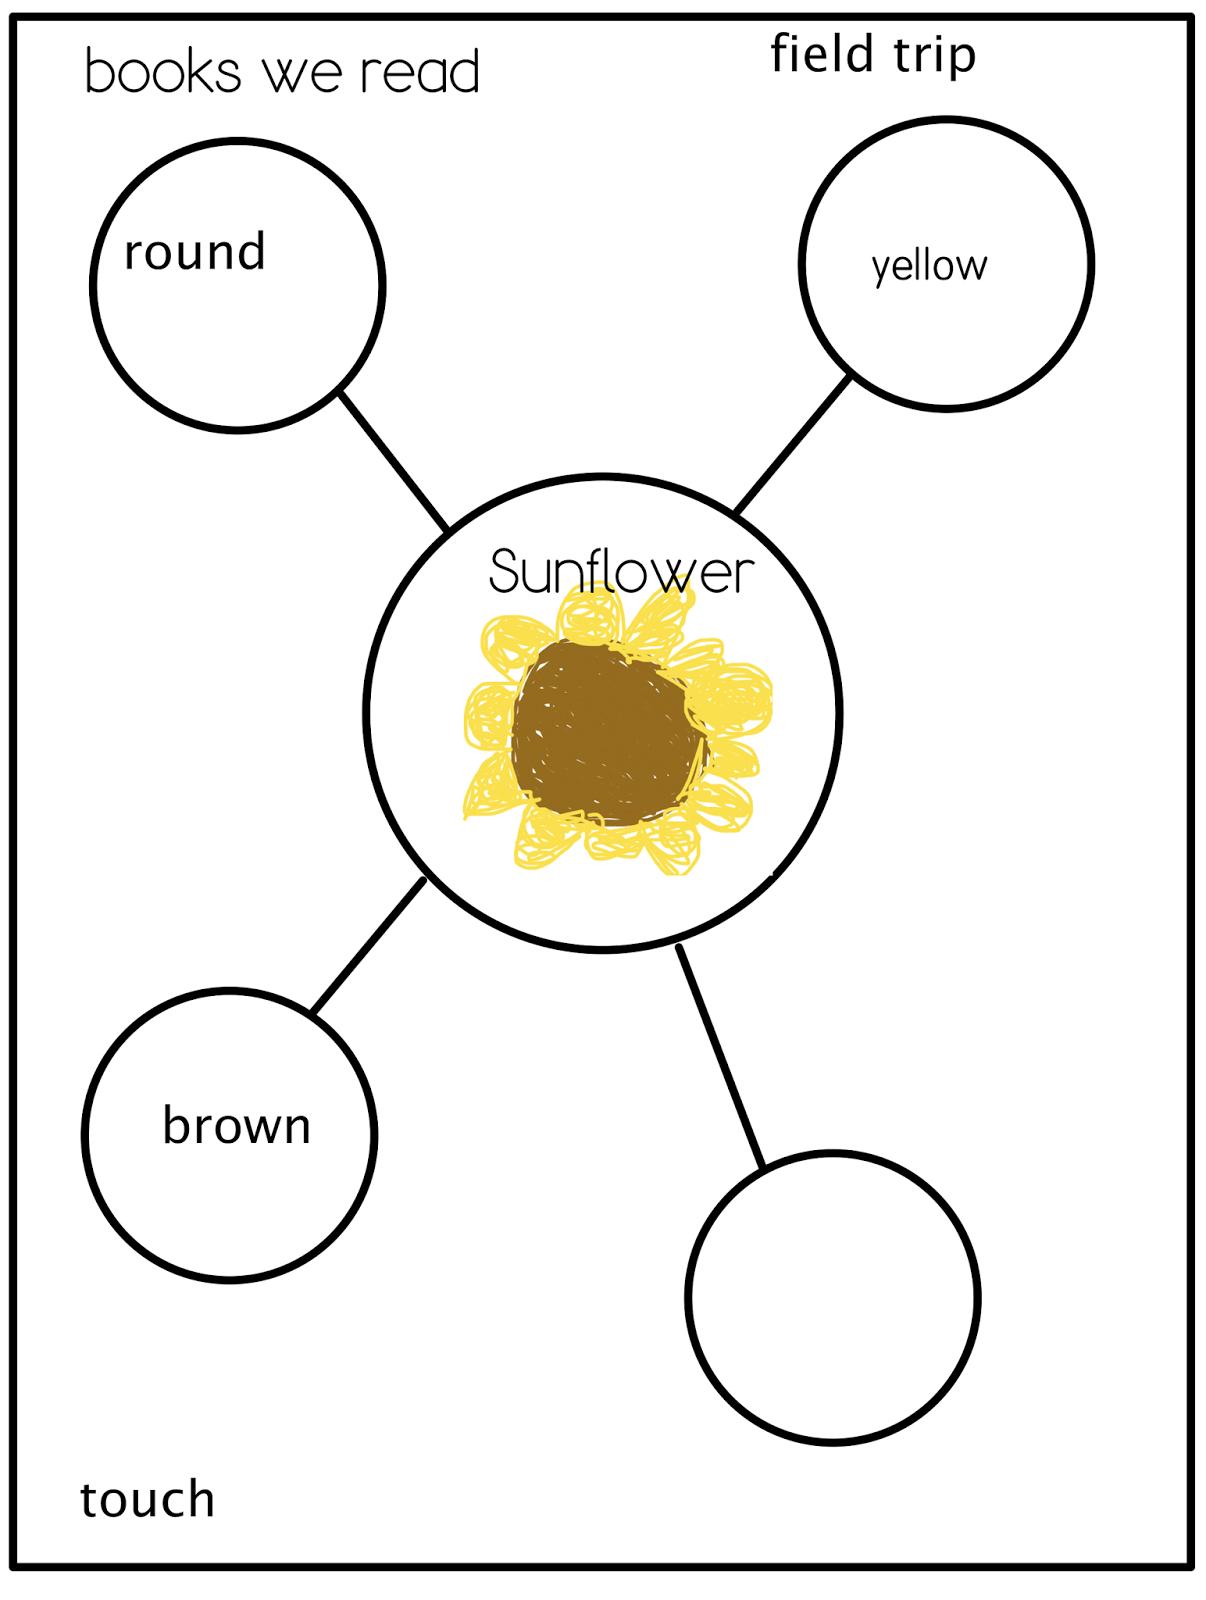 Joyful Learning In Kc Sunflowers And Summer